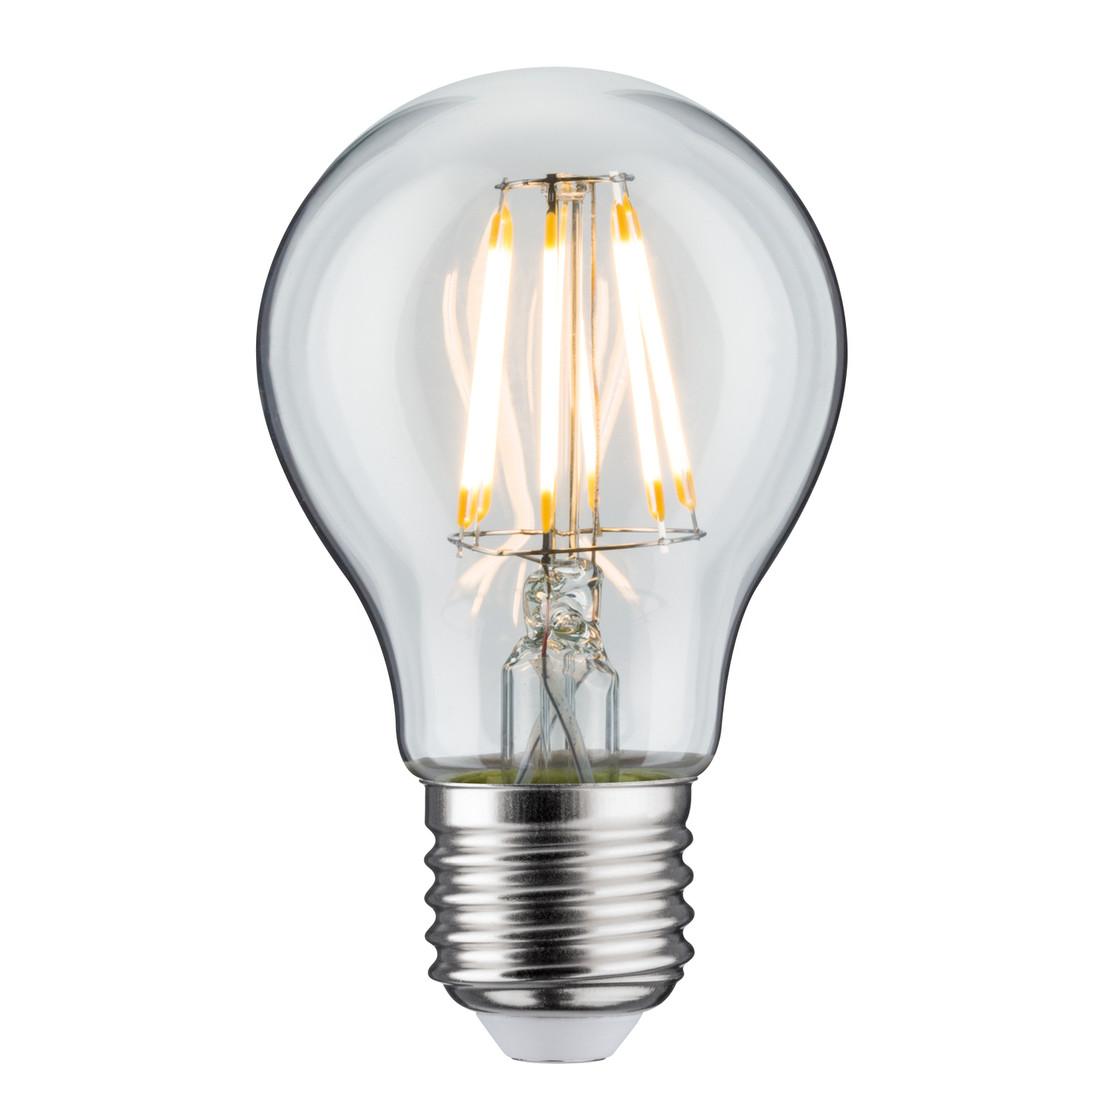 Paulmann led filament vintage agl retrolampe 7 5w for Lampen rampe